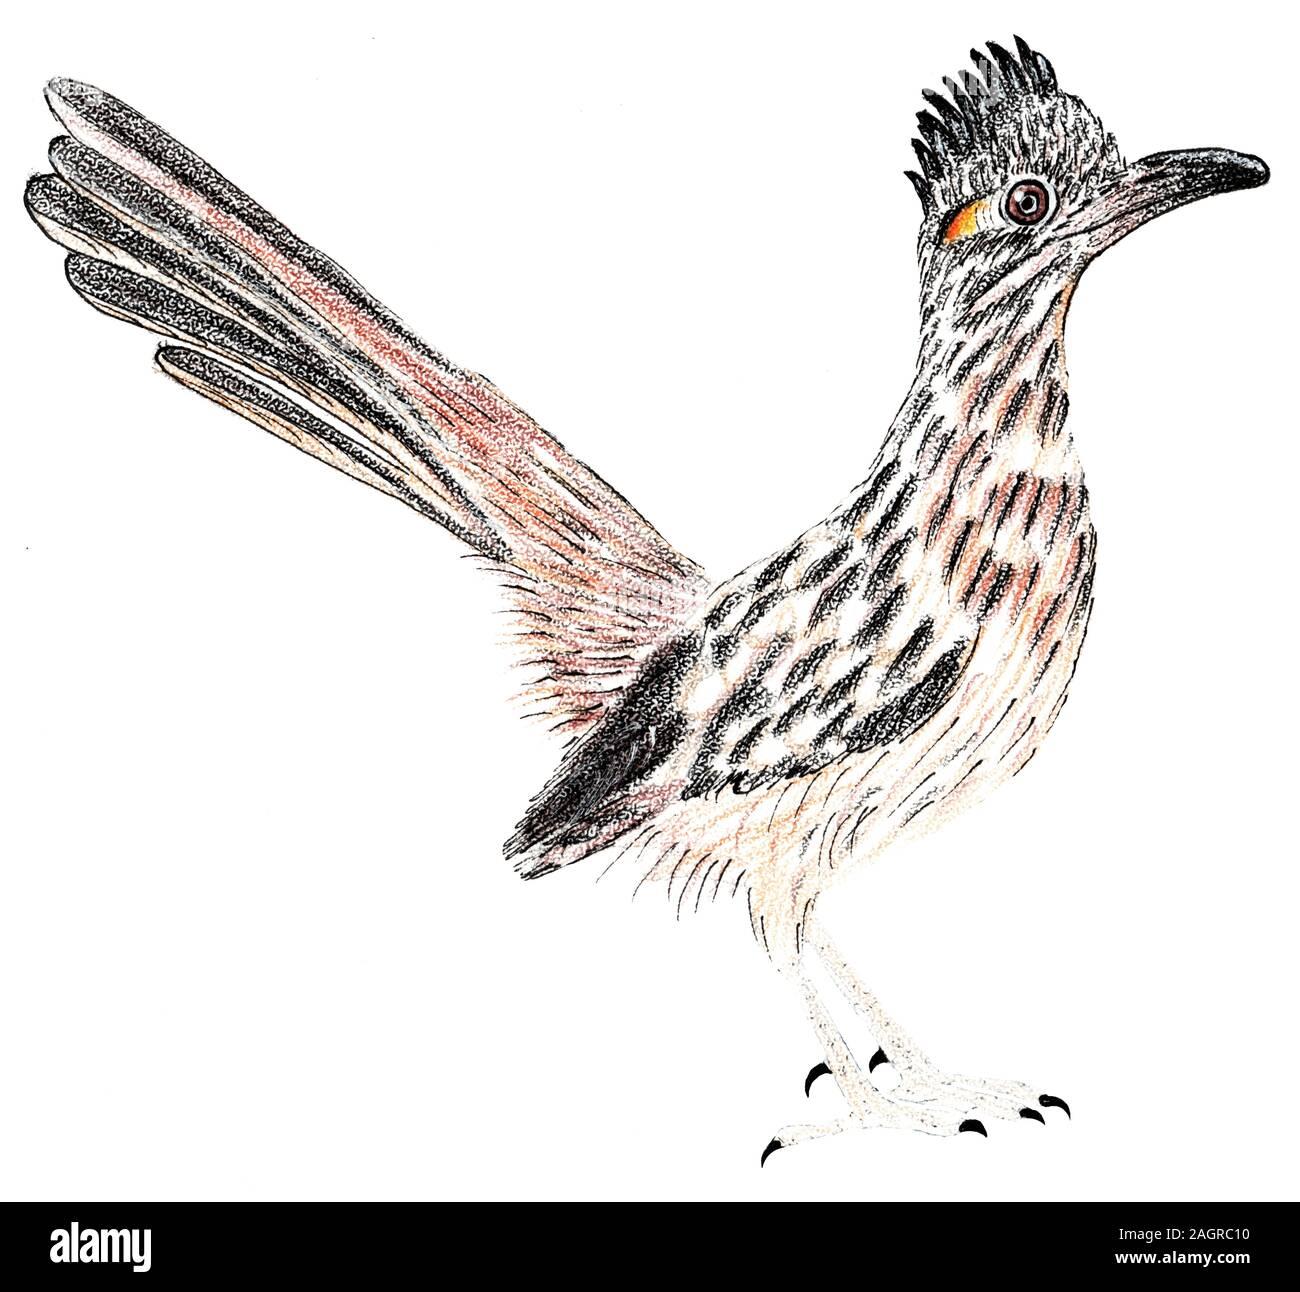 Road Runner Greater Roadrunner Geococcyx Californianus Bird Illustration Stock Photo Alamy